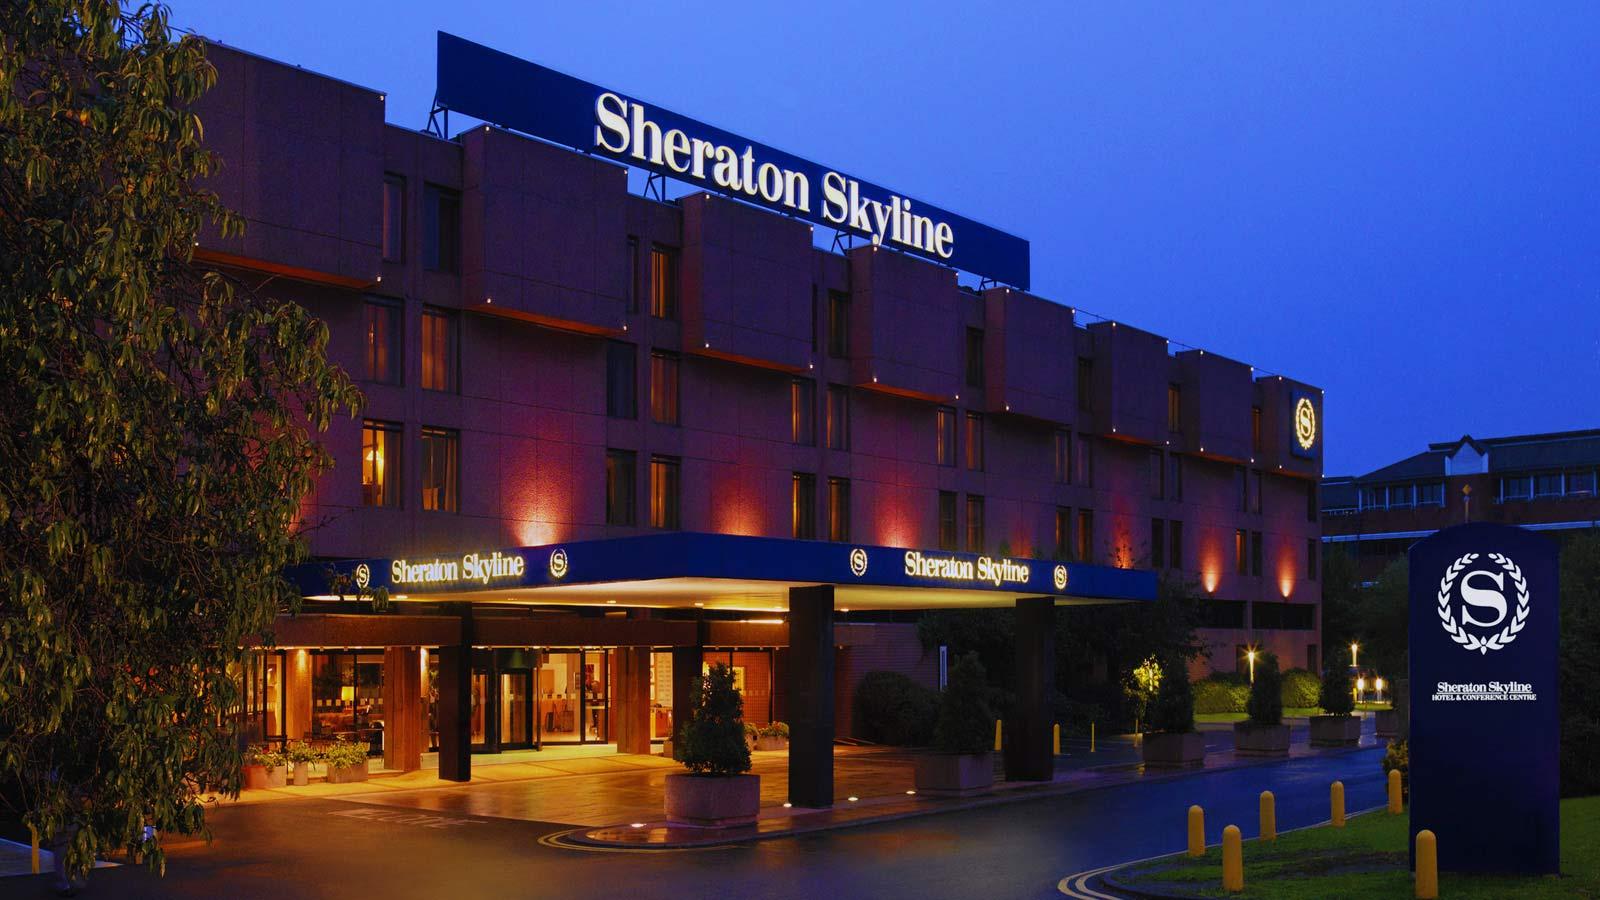 Sheraton Skyline Hotel London Heathrow United Kingdom Flyin